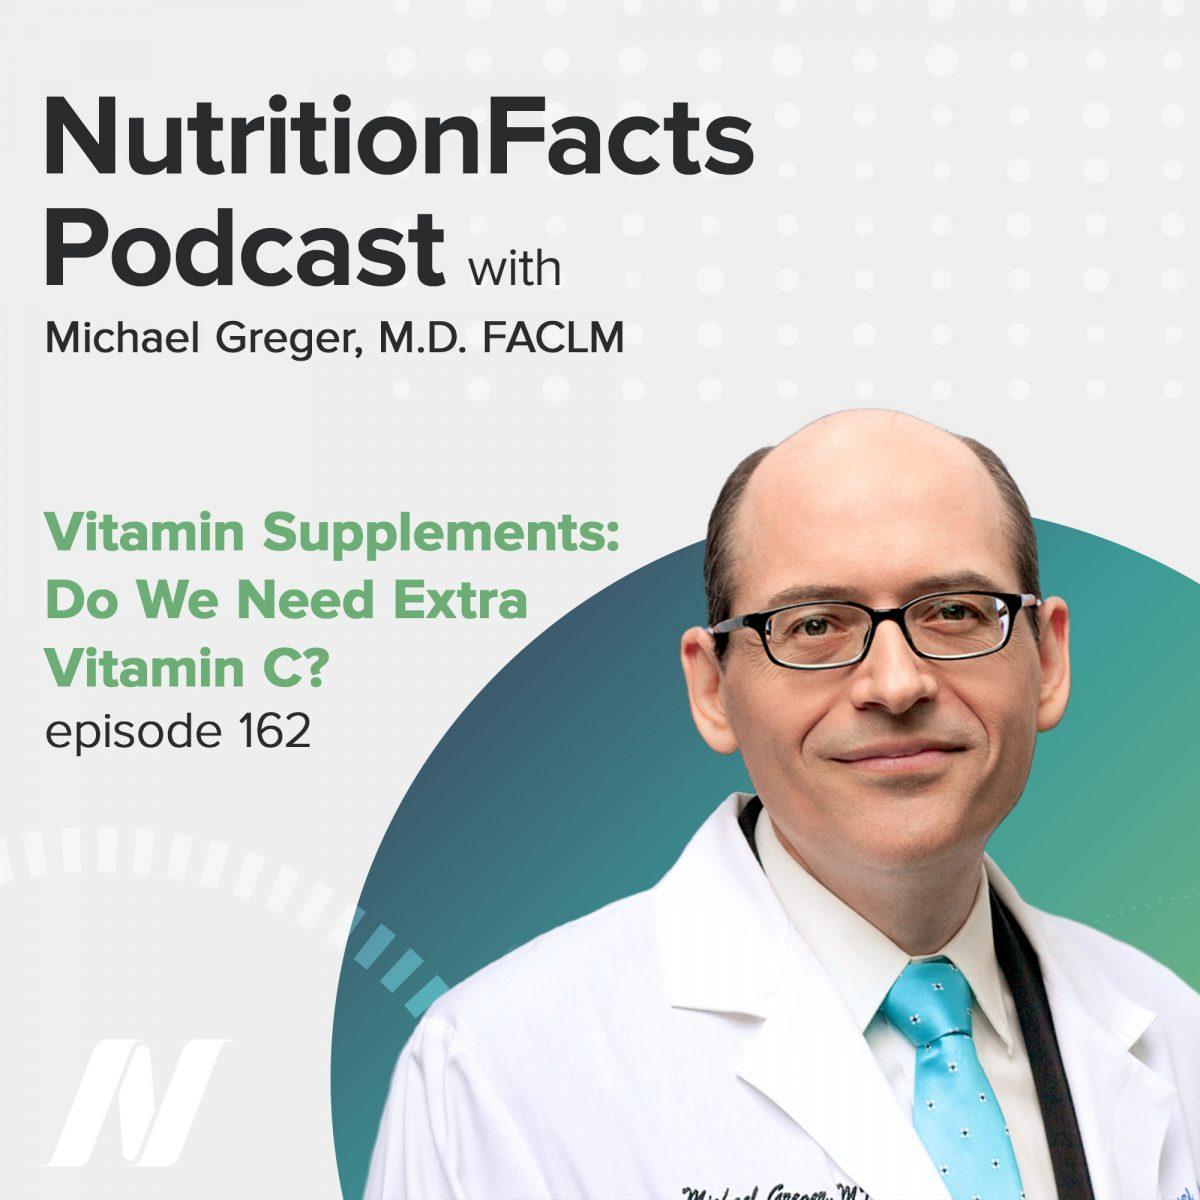 Vitamin Supplements: Do We Need Extra Vitamin C? ?>